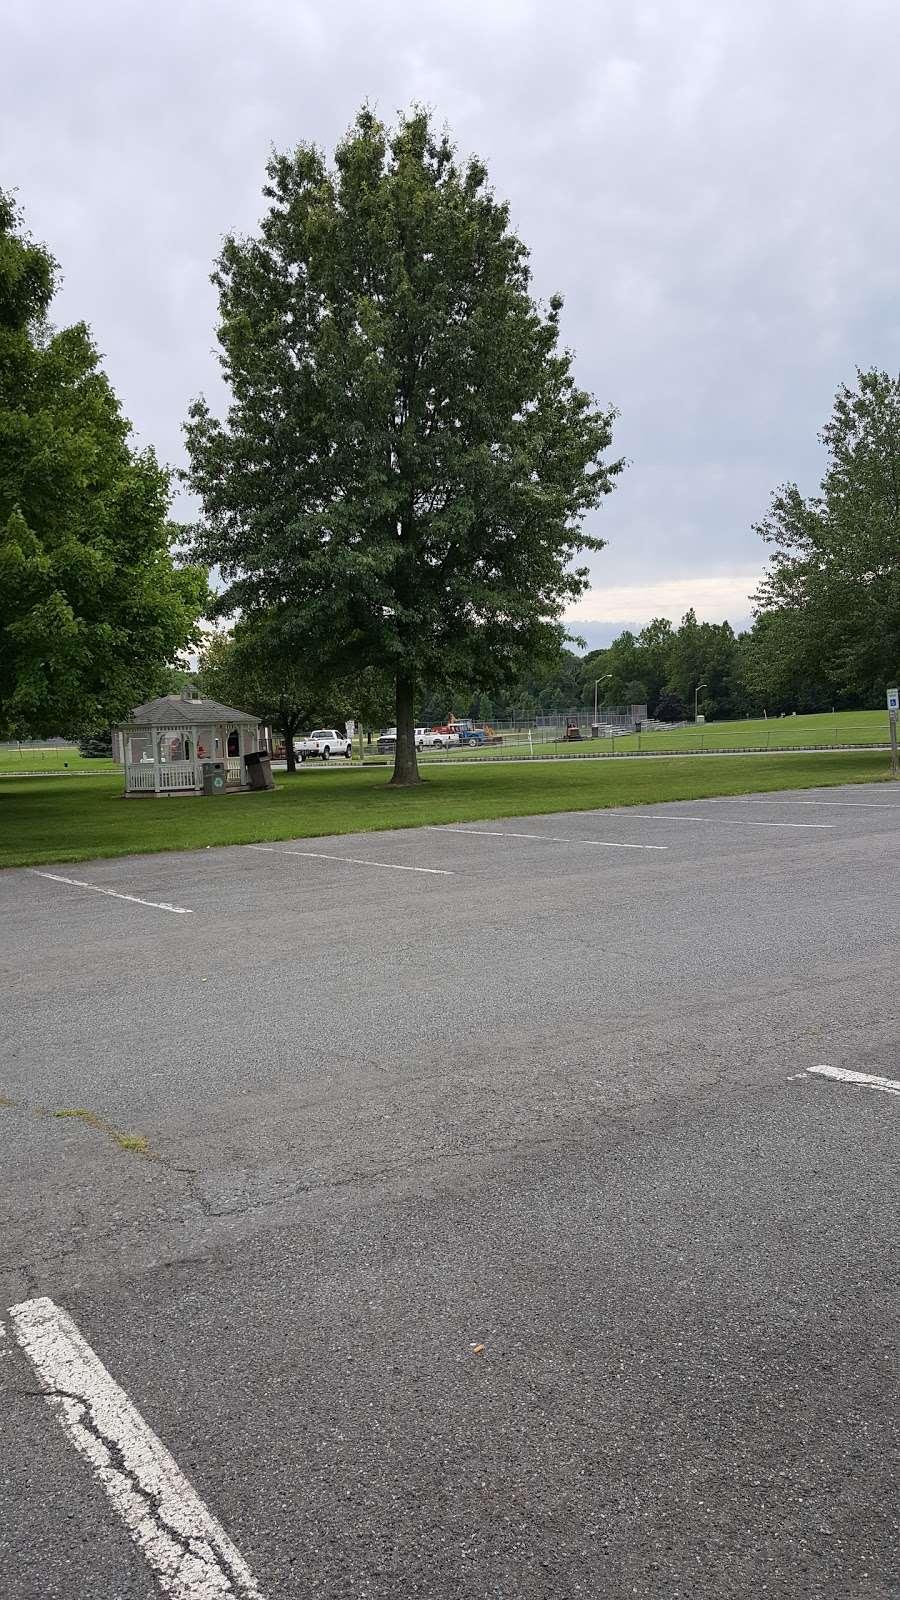 Lenape Park - park    Photo 10 of 10   Address: Flemington, NJ 08822, USA   Phone: (908) 806-6100